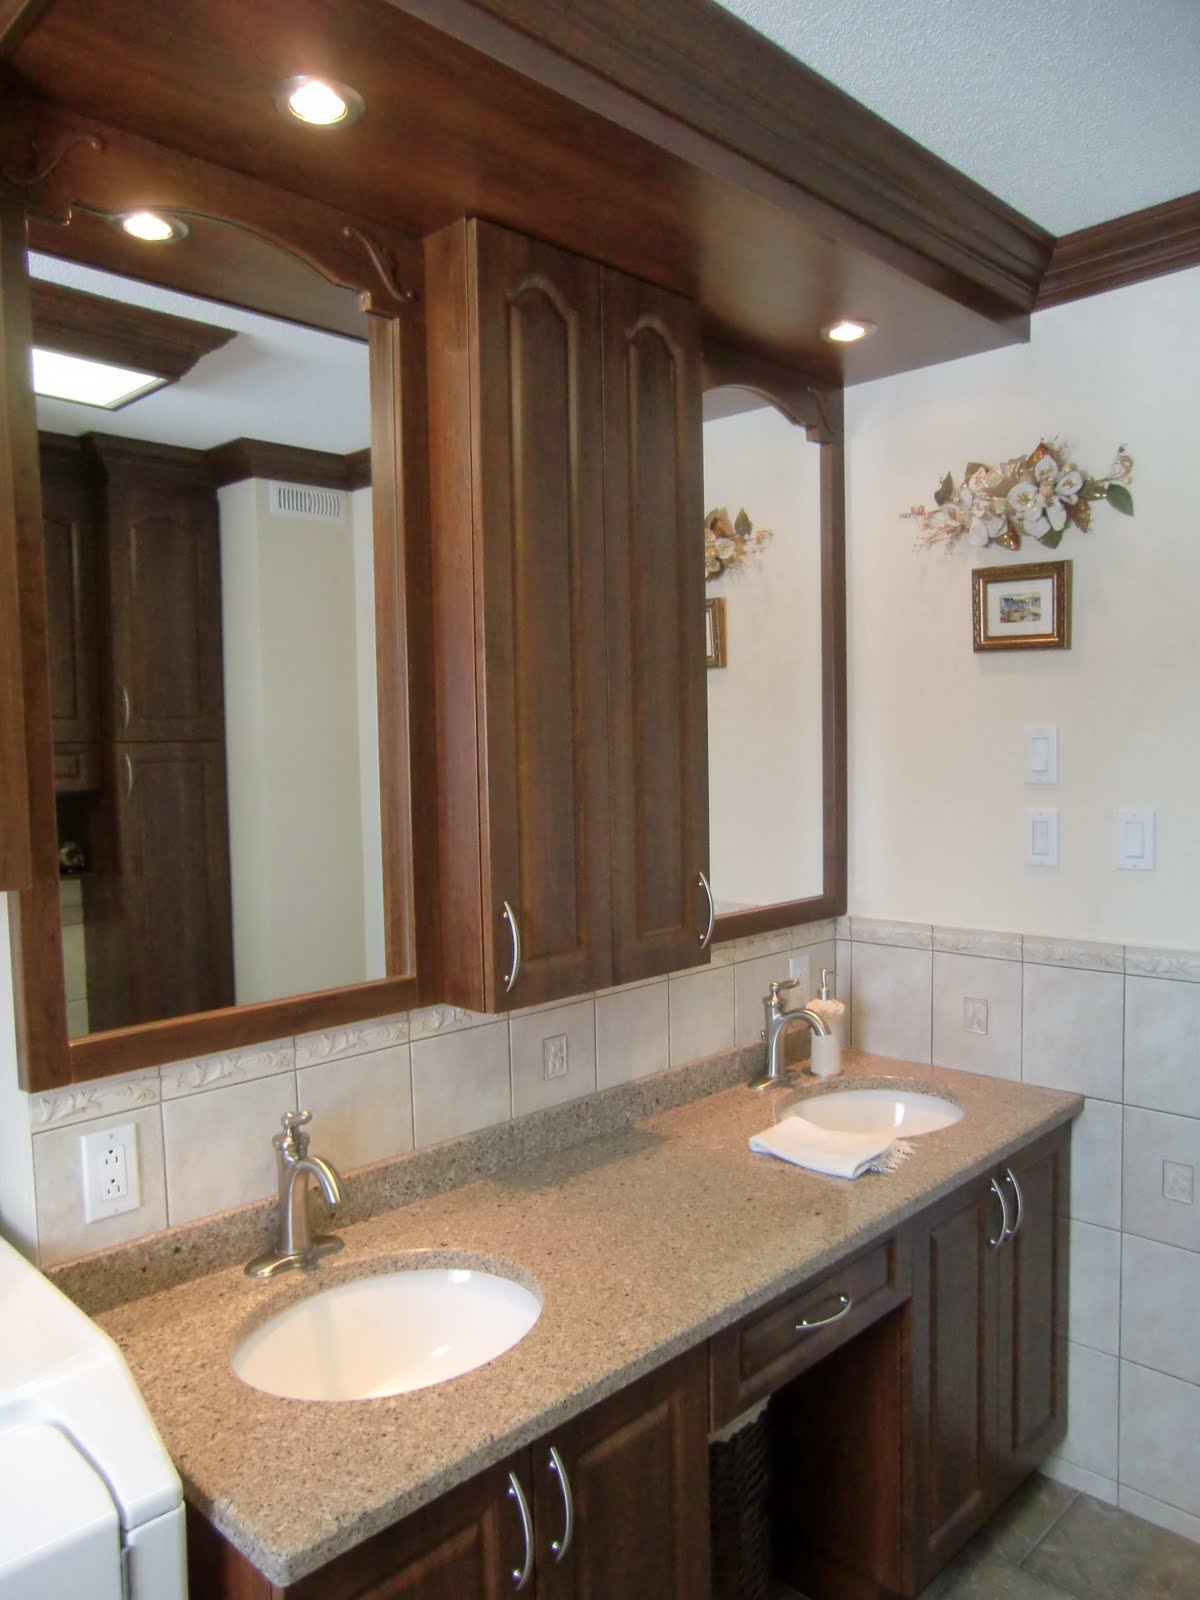 specialit smm armoire de salle de bain en thermoplastique comptoir en granit. Black Bedroom Furniture Sets. Home Design Ideas